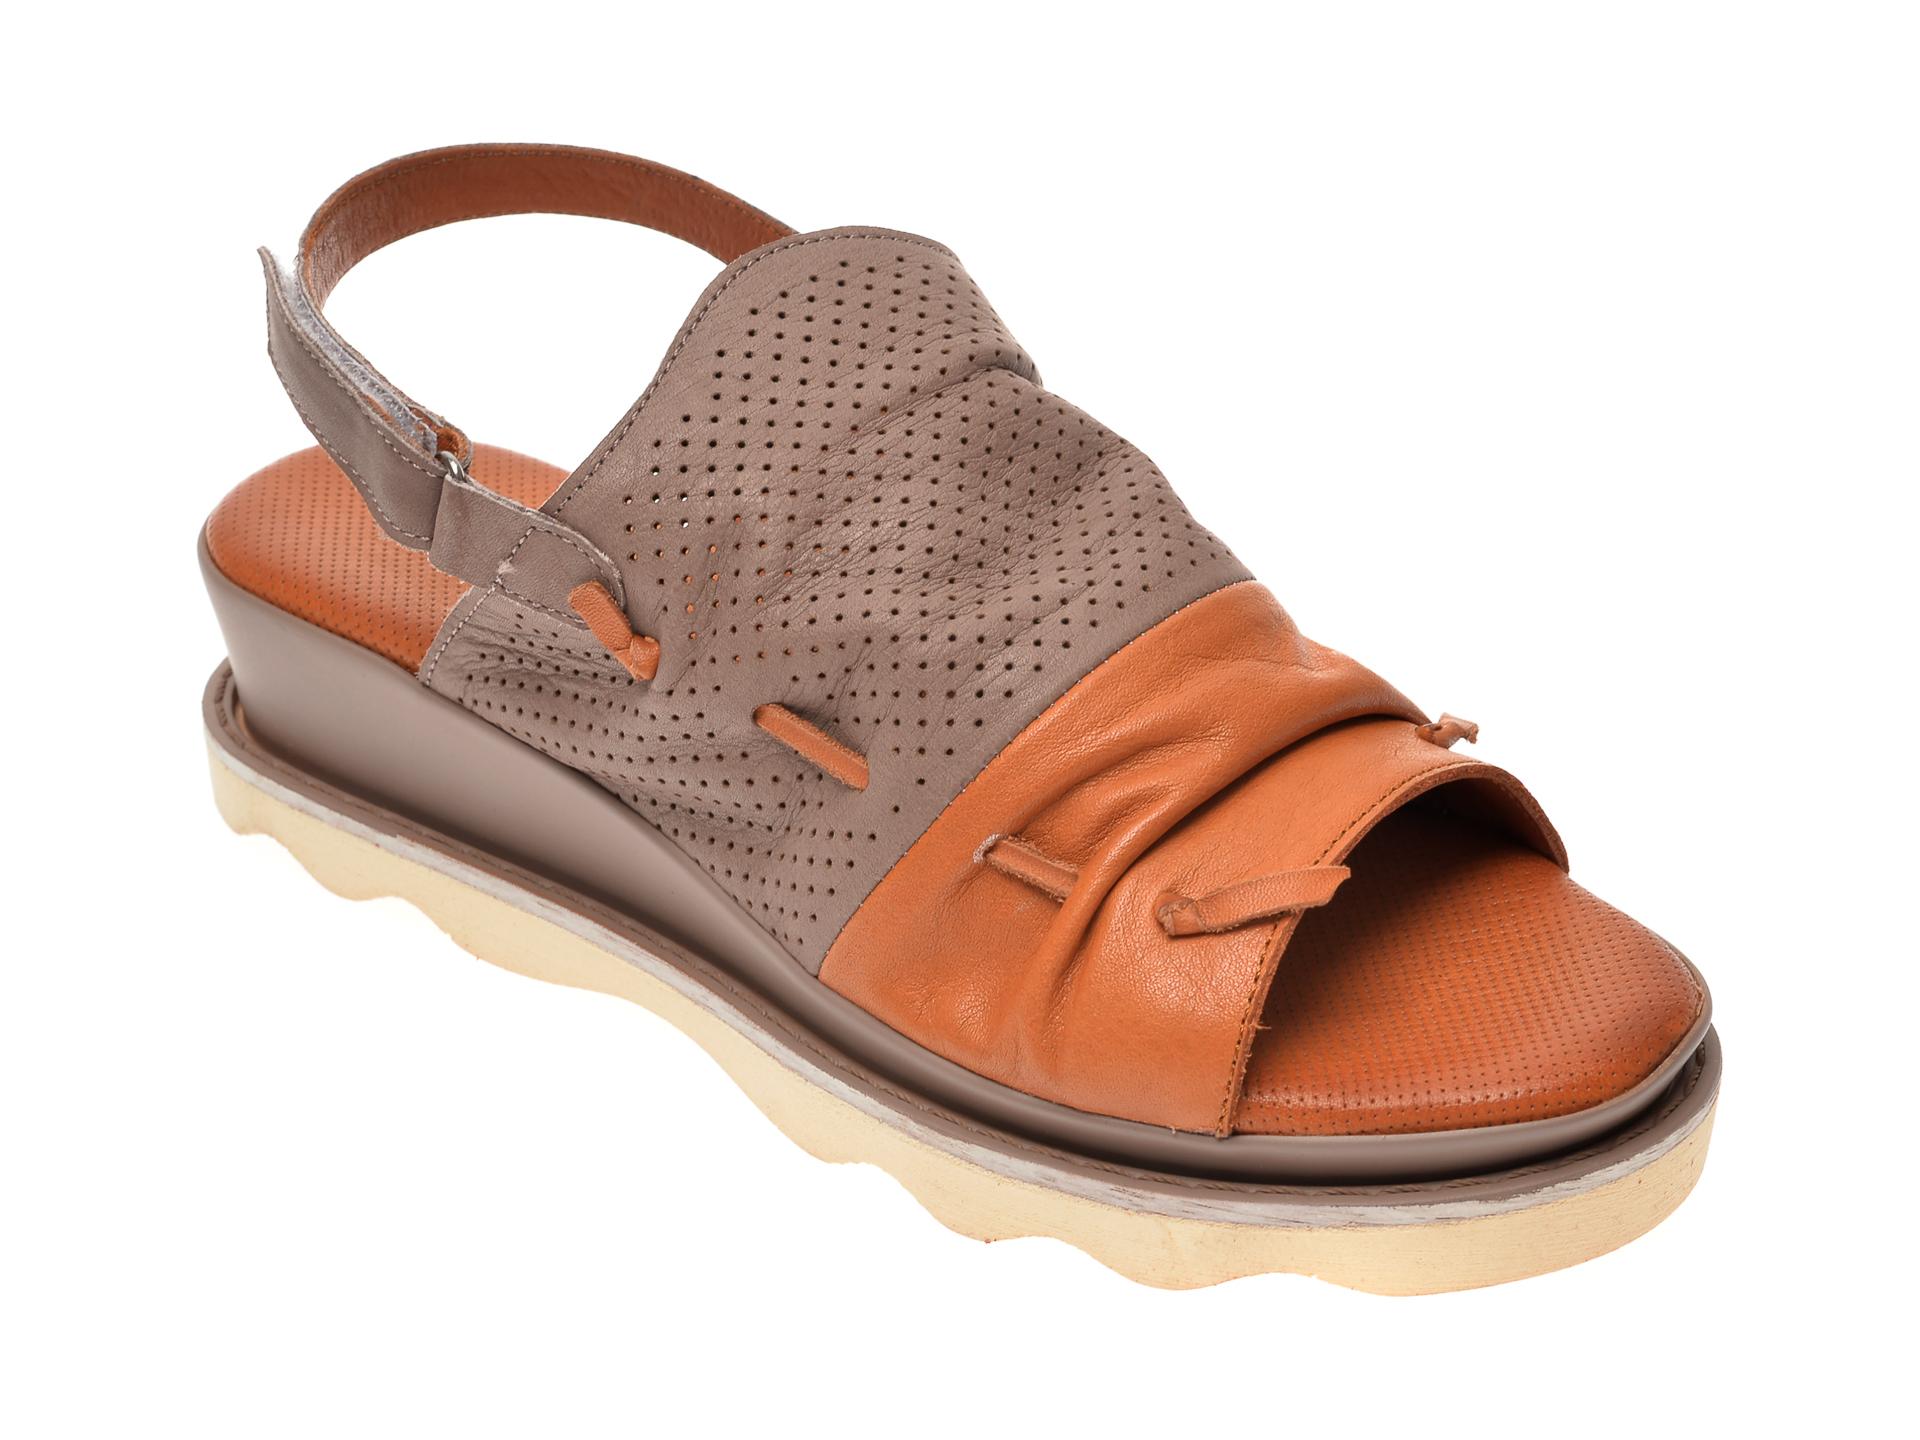 Sandale FLAVIA PASSINI maro, 0206, din piele naturala